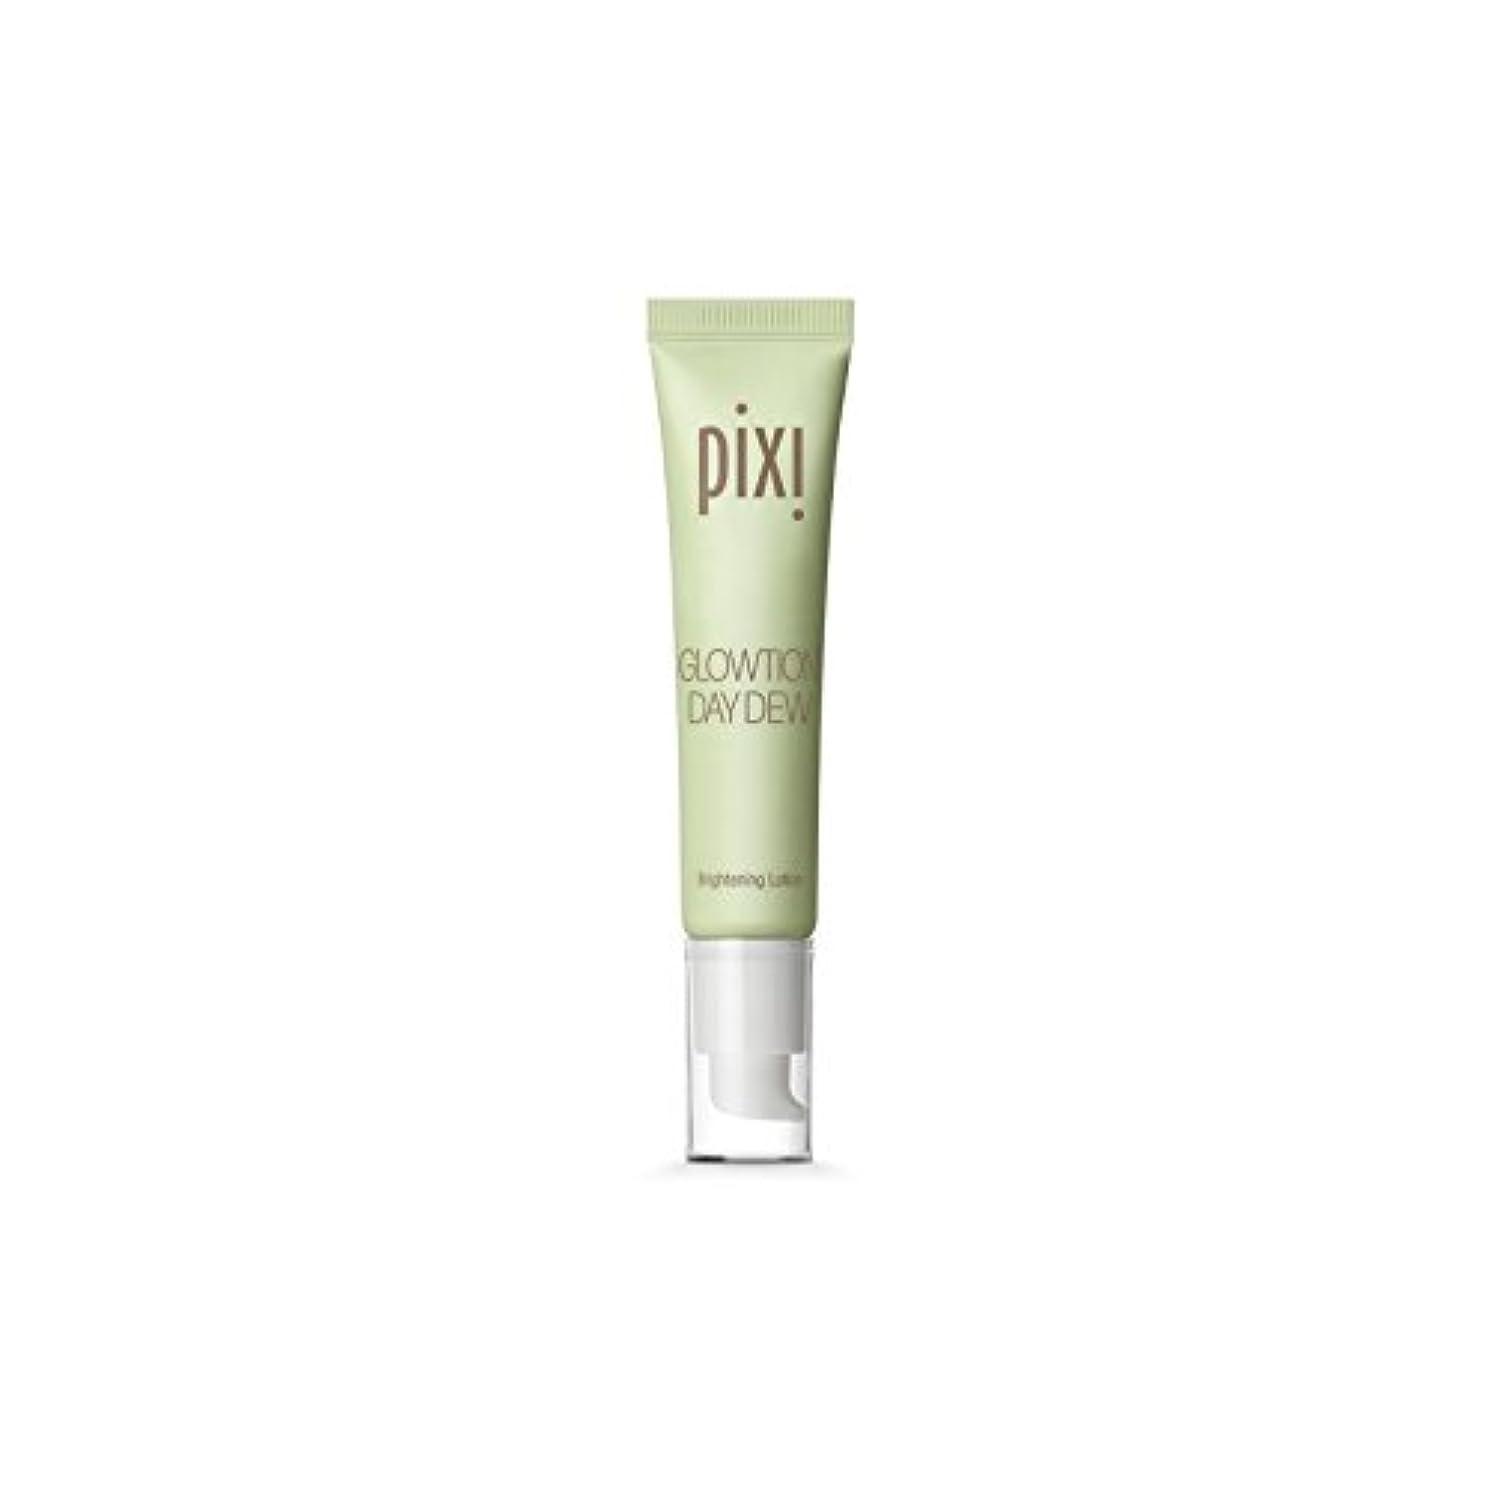 Pixi Pixi Glowtion Day Dew (Pack of 6) - 日露 x6 [並行輸入品]